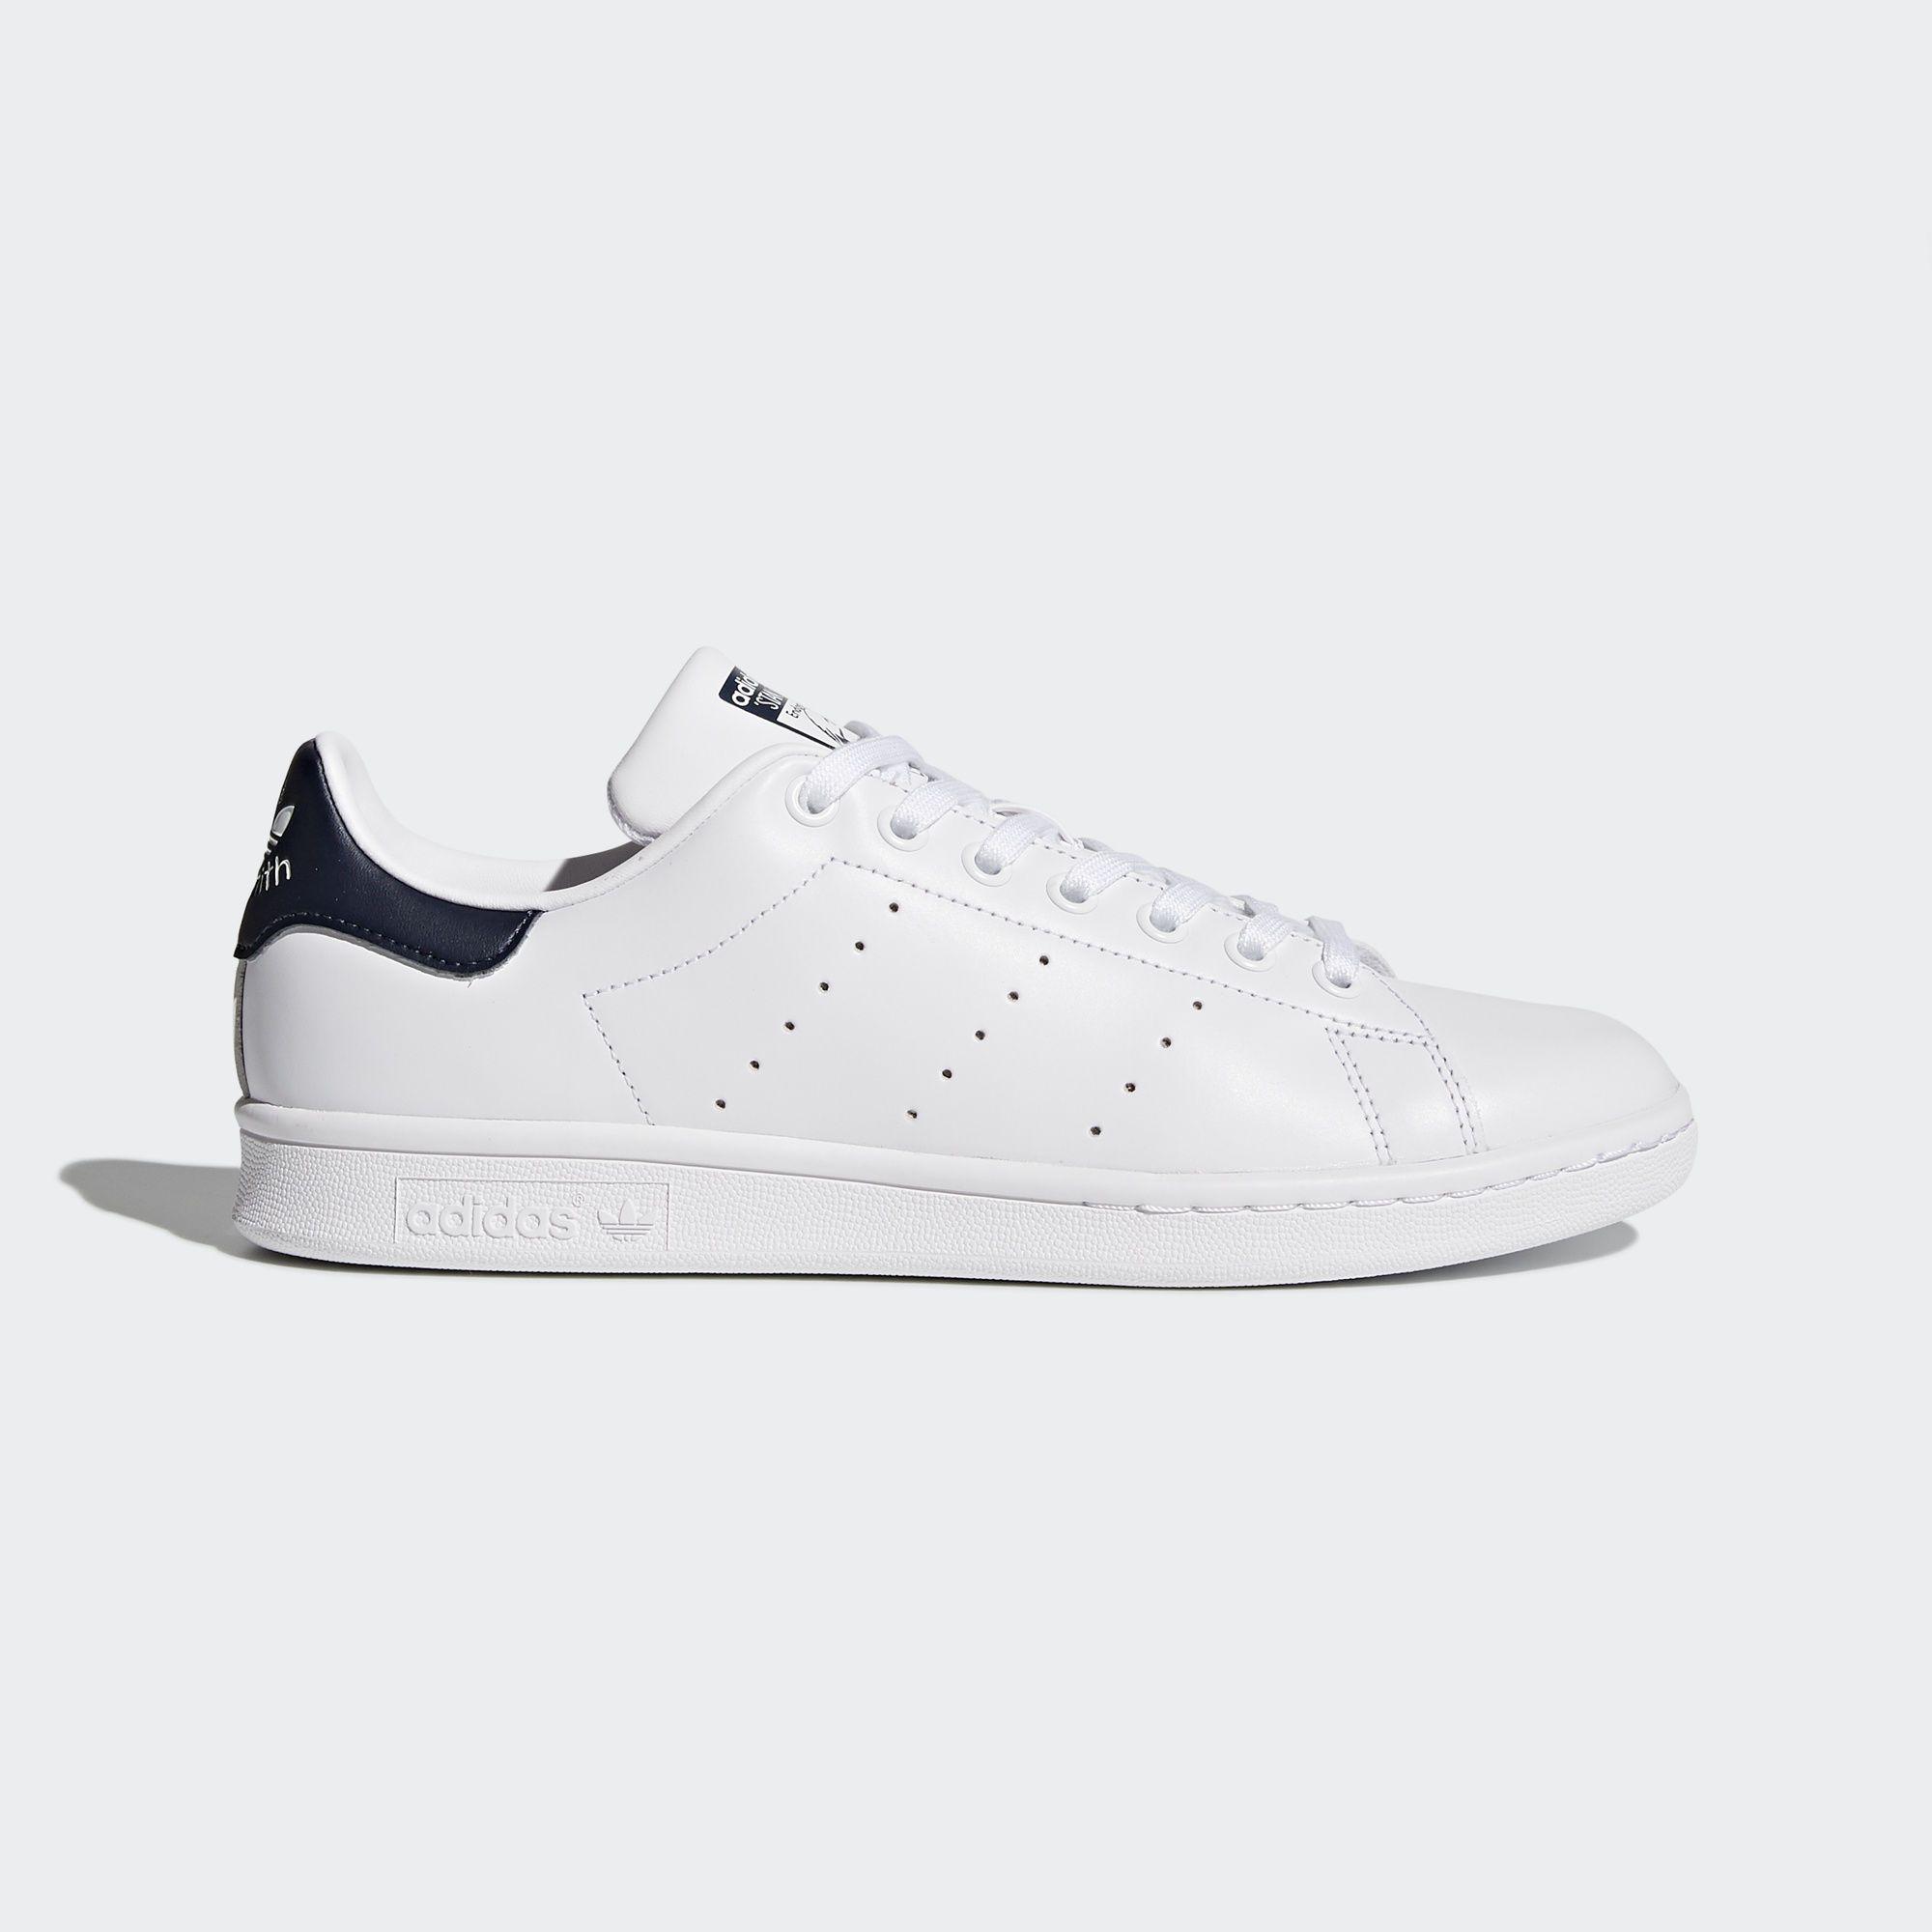 Stan Smith Shoes Zapatos Stan Smith Adidas Stan Smith Tenis Blancos